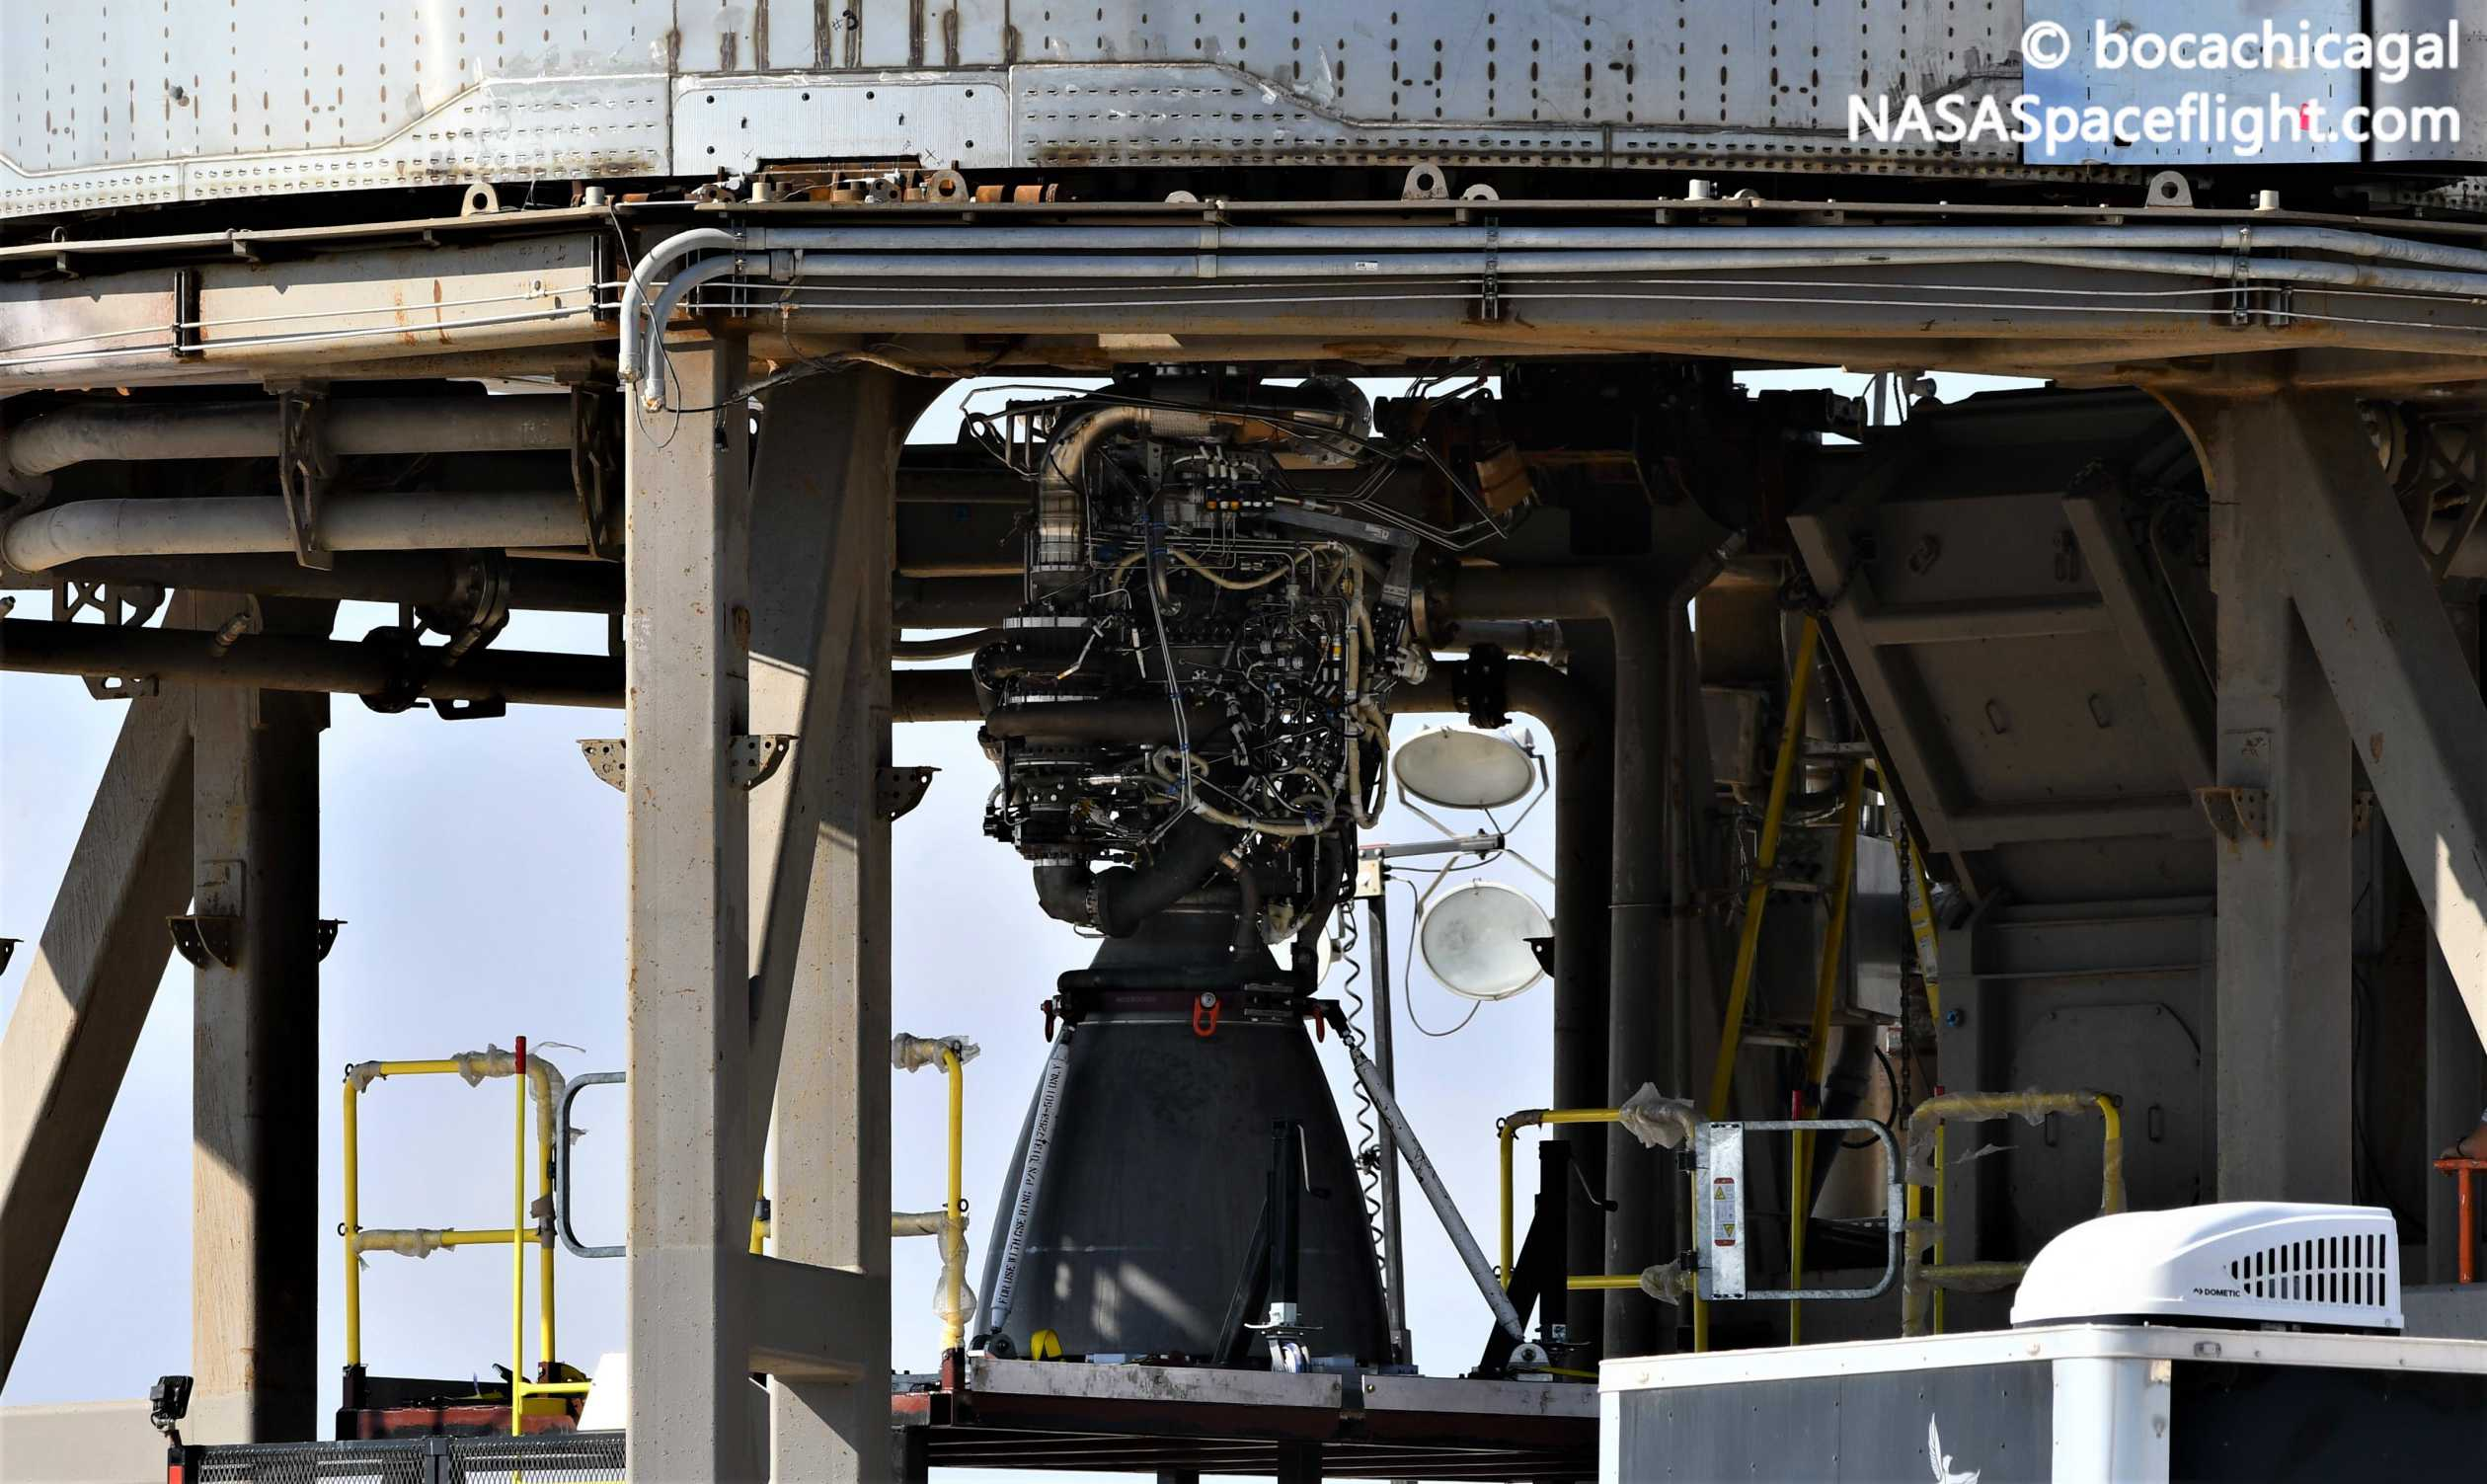 Starship Boca Chica 101120 (NASASpaceflight – bocachicagal) SN8 Raptor install 3 crop (c)